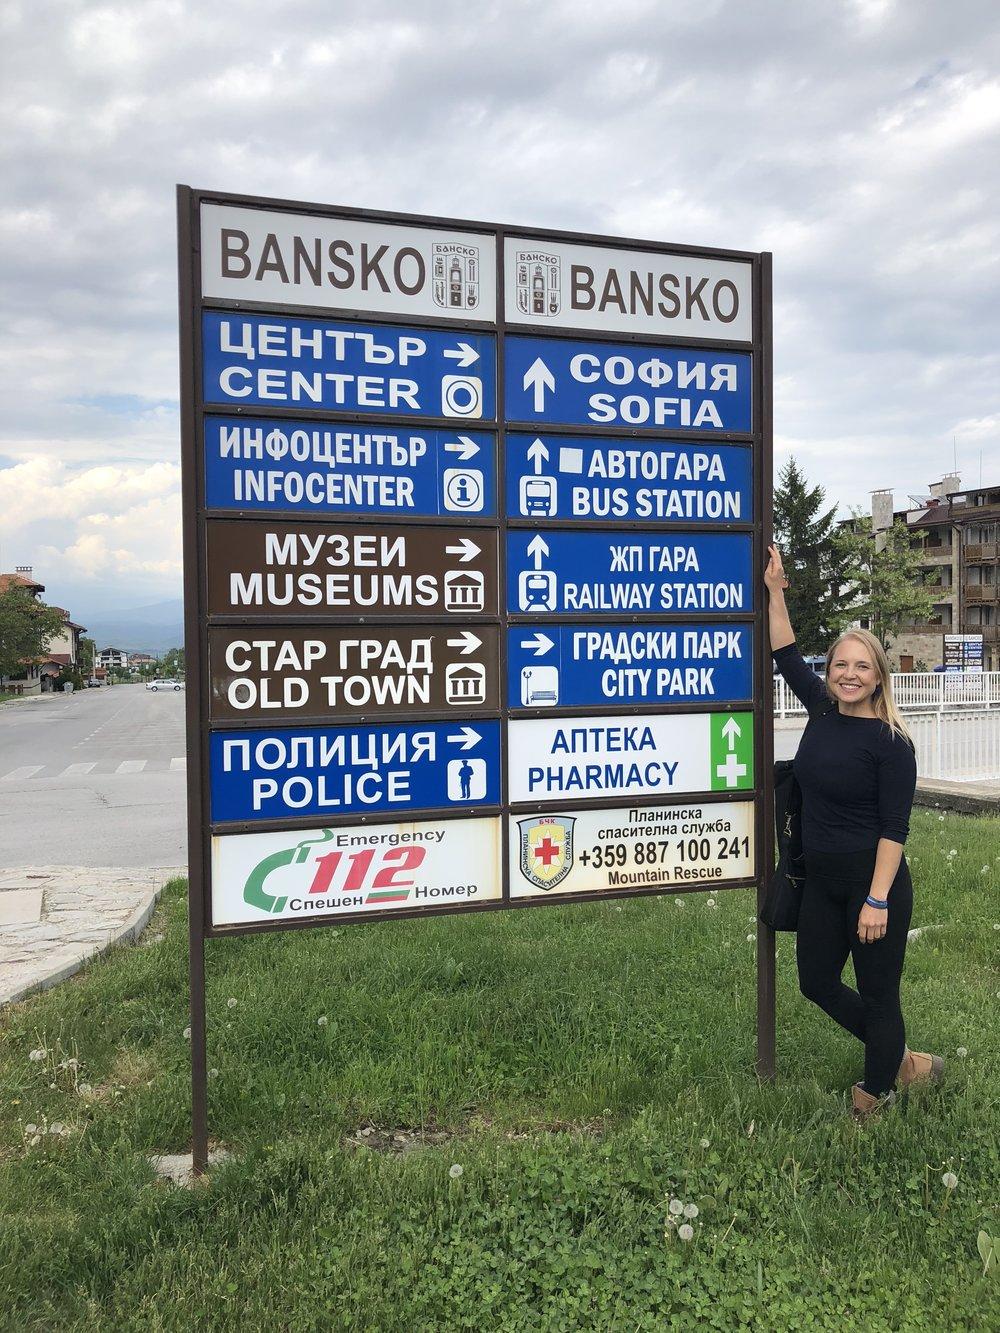 A new fan of Bansko, Bulgaria!